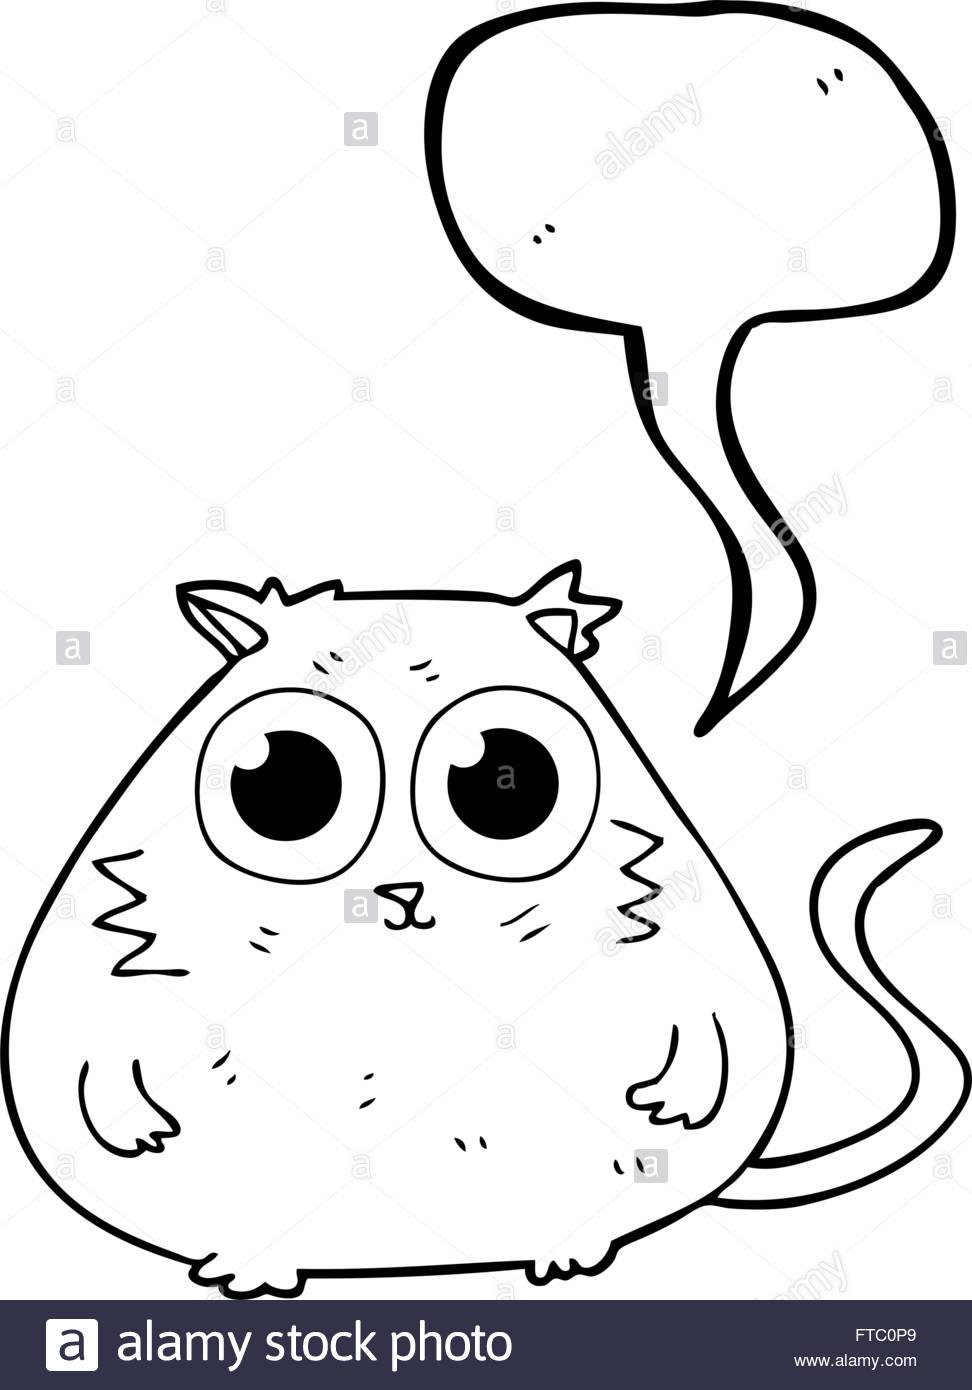 972x1390 Freehand Drawn Speech Bubble Cartoon Cat With Big Pretty Eyes